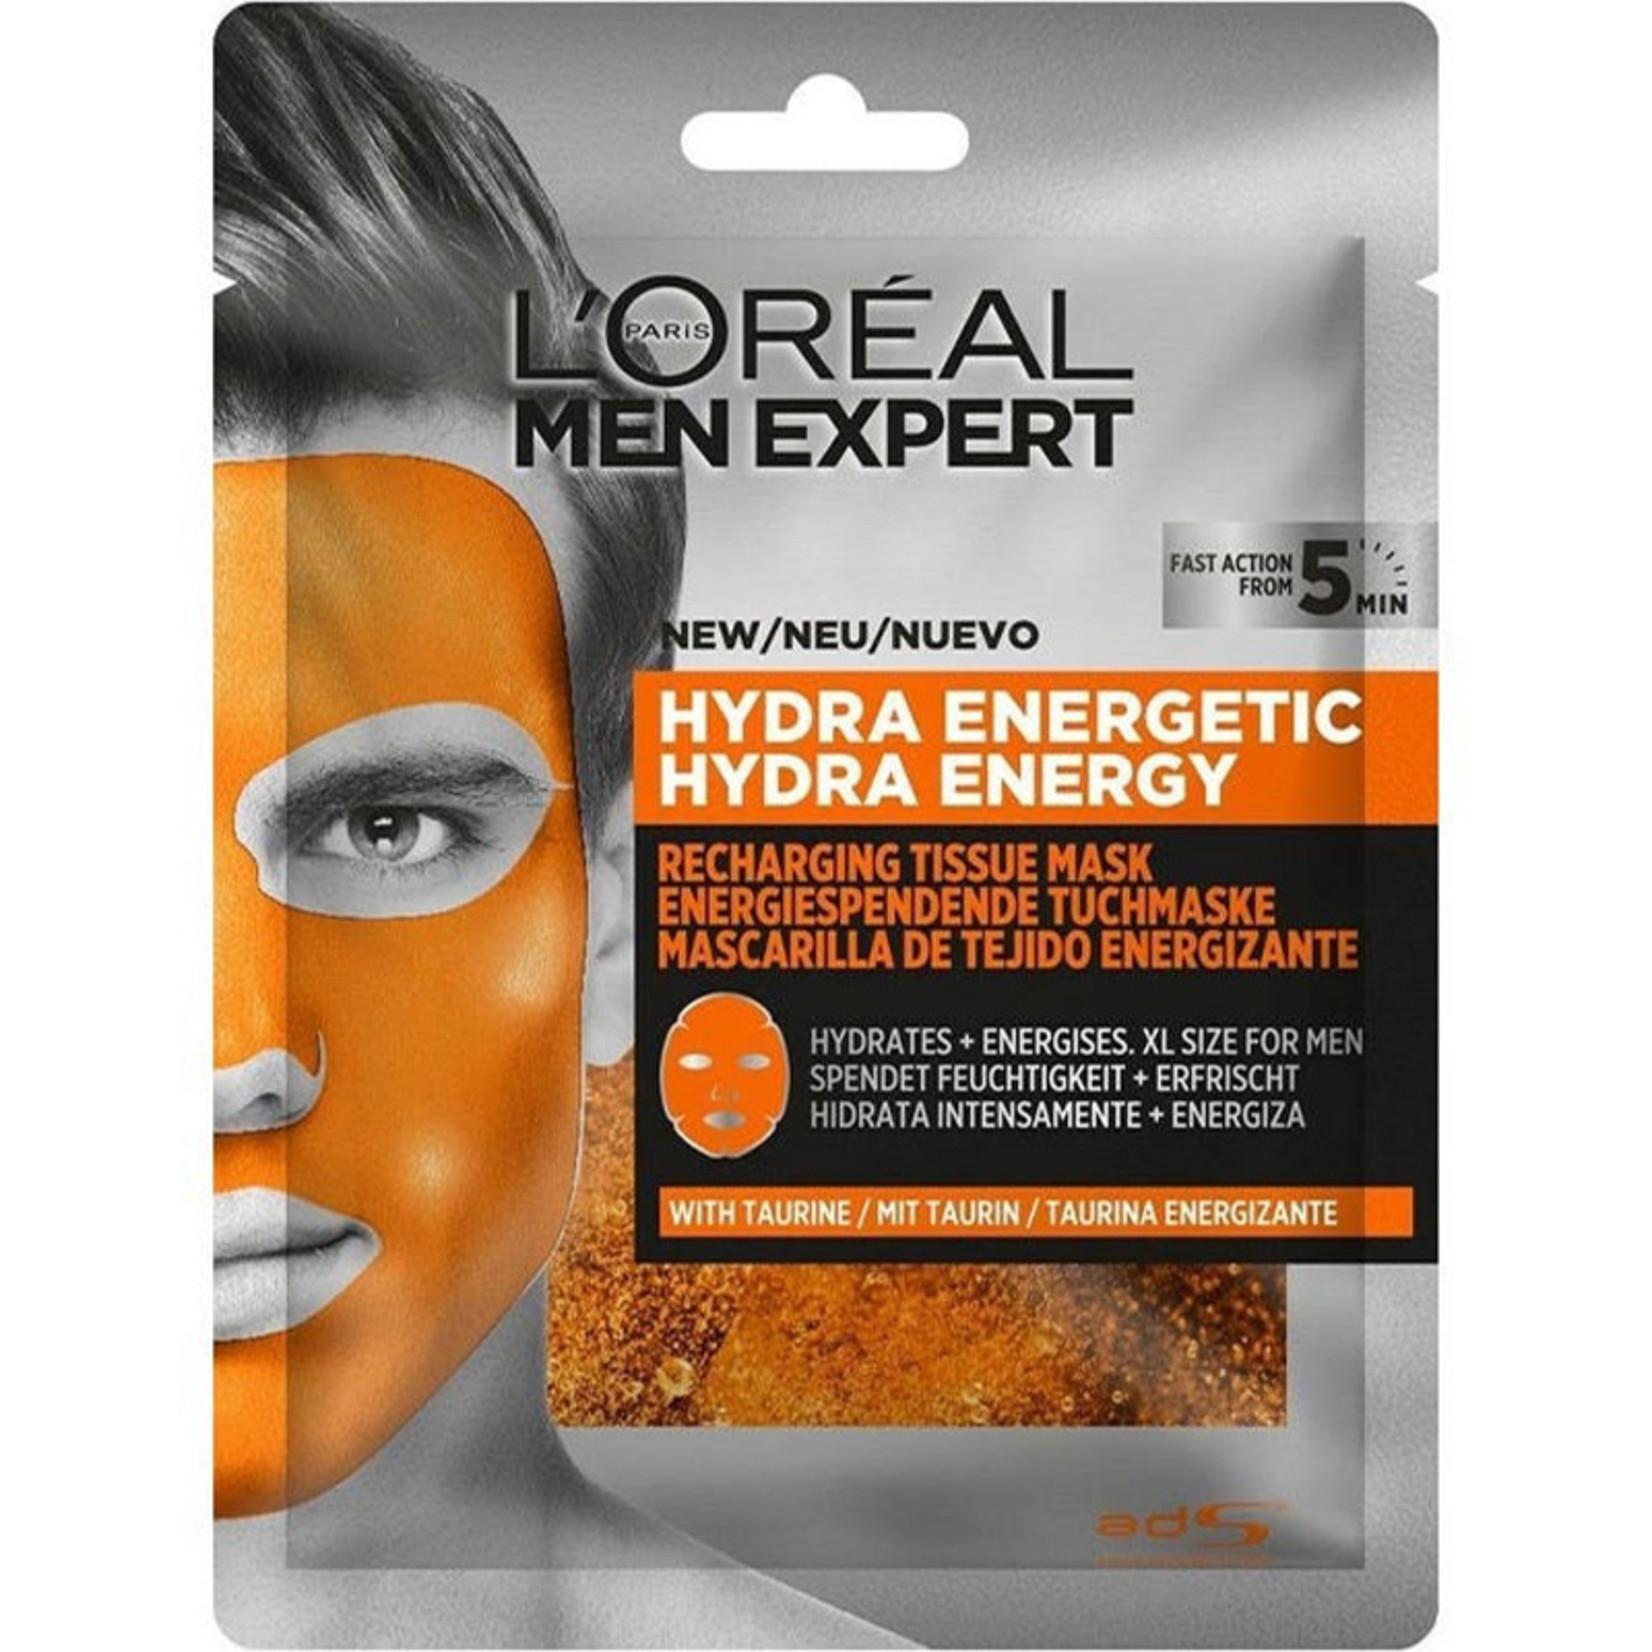 L'Oréal Men Expert Hydra Energy Taurin Tuchmaske